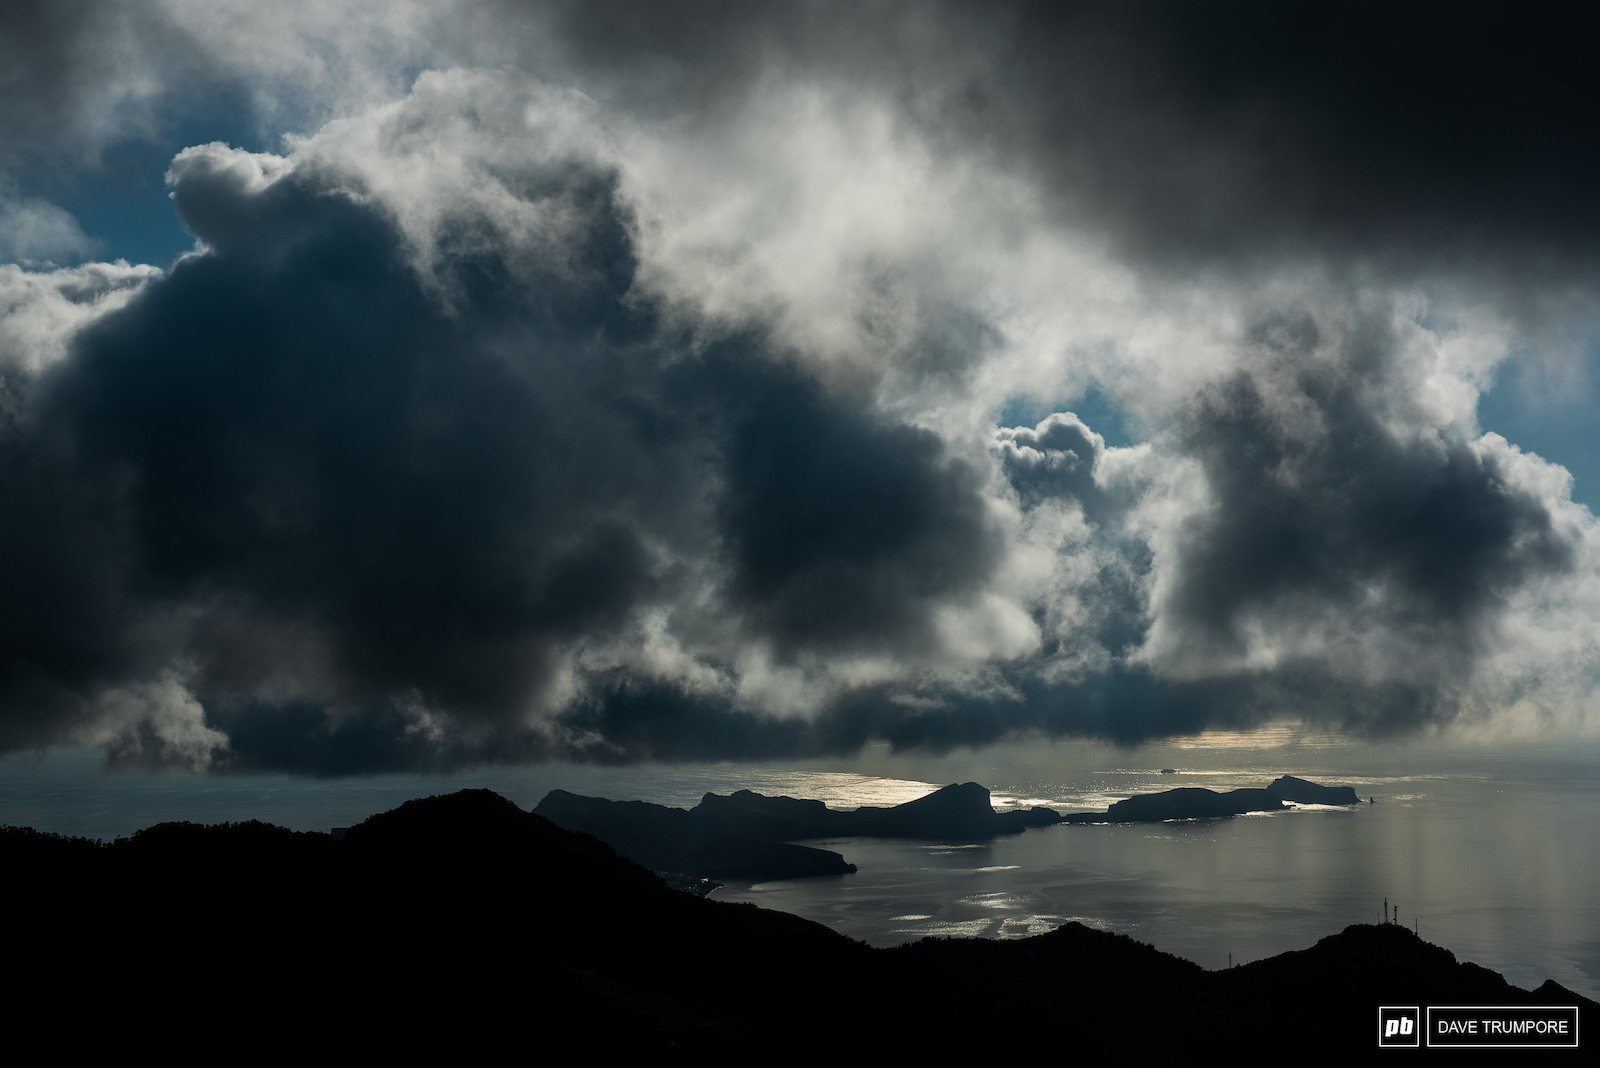 Moody Madeira weather but so far no rain